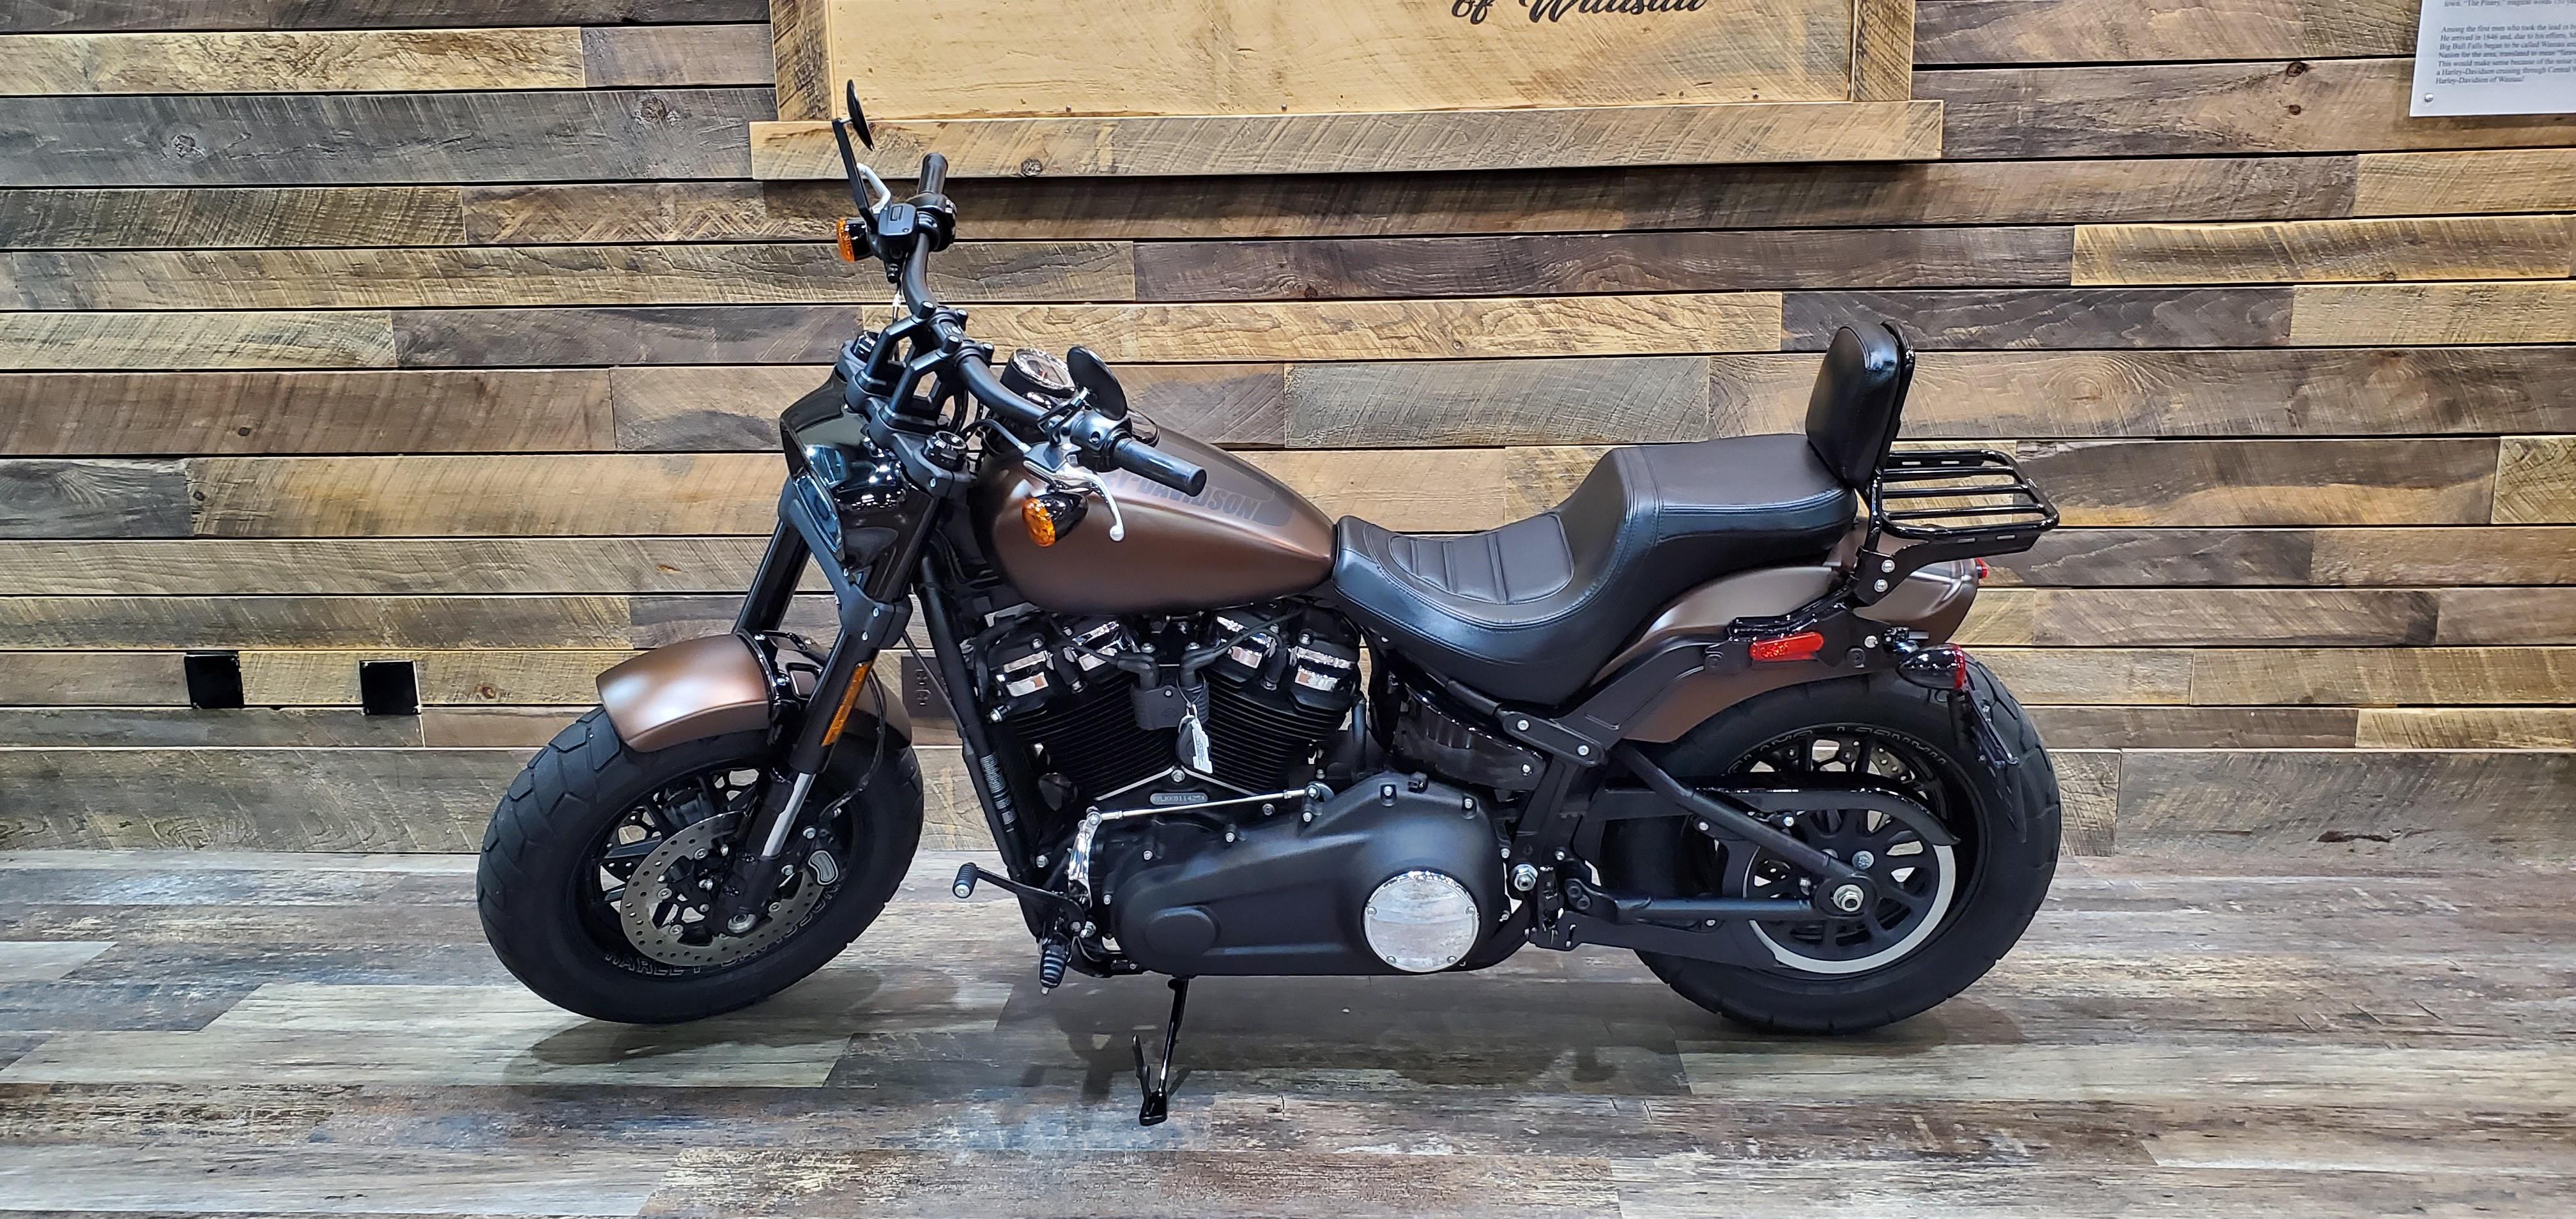 2019 Harley-Davidson Softail Fat Bob 114 at Bull Falls Harley-Davidson